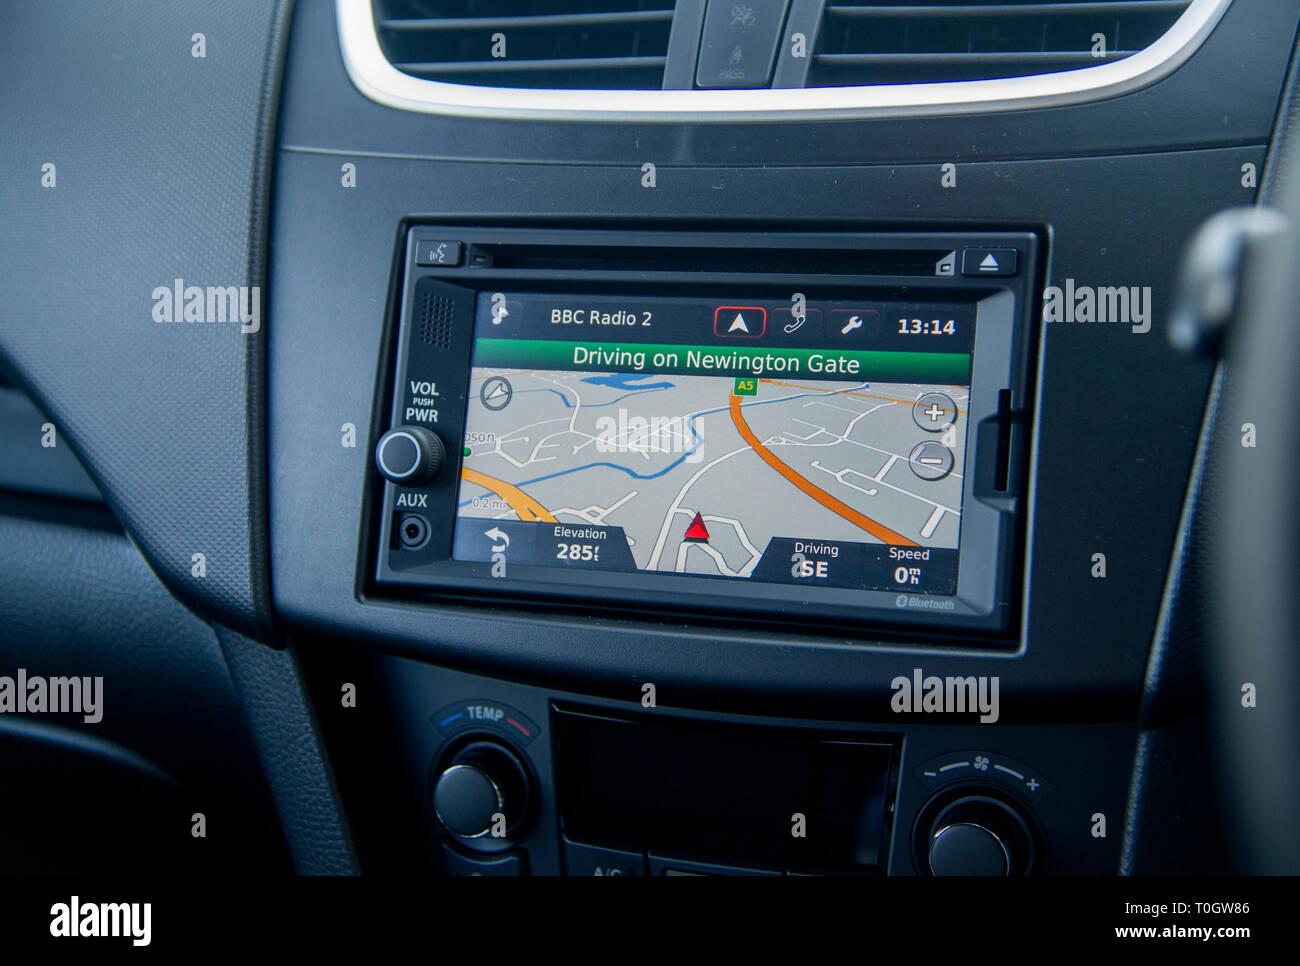 Sat nav screen in a car dashboard, double din size headunit - Stock Image